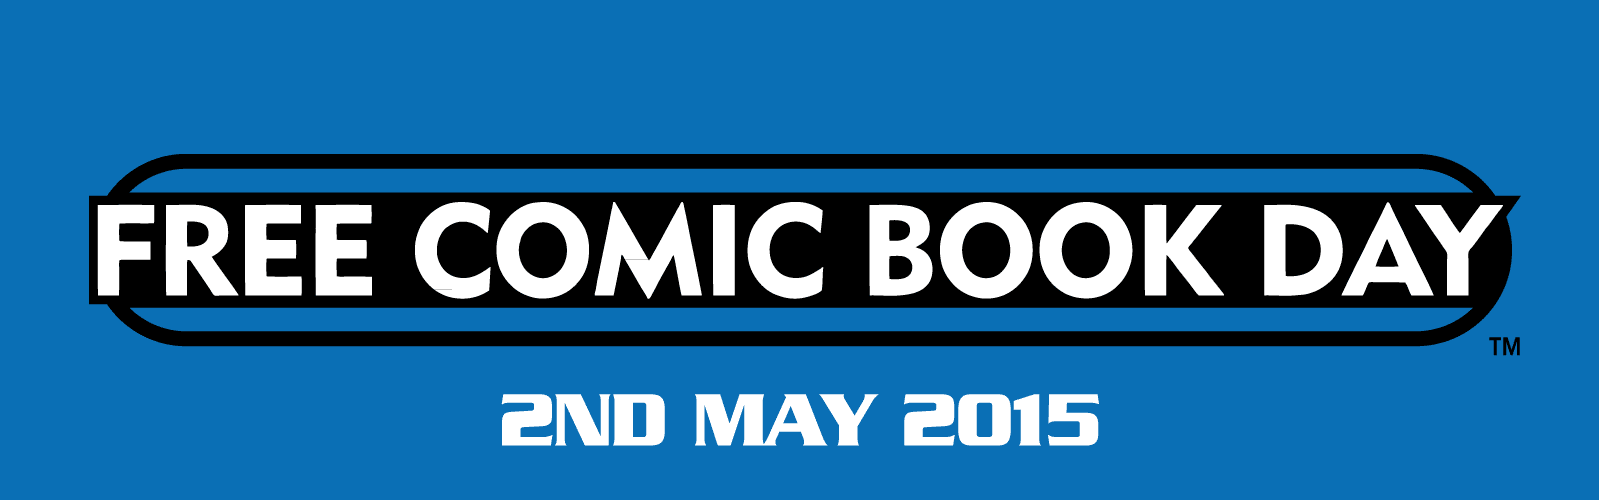 Free-Comic-Book-Day-2015-logo